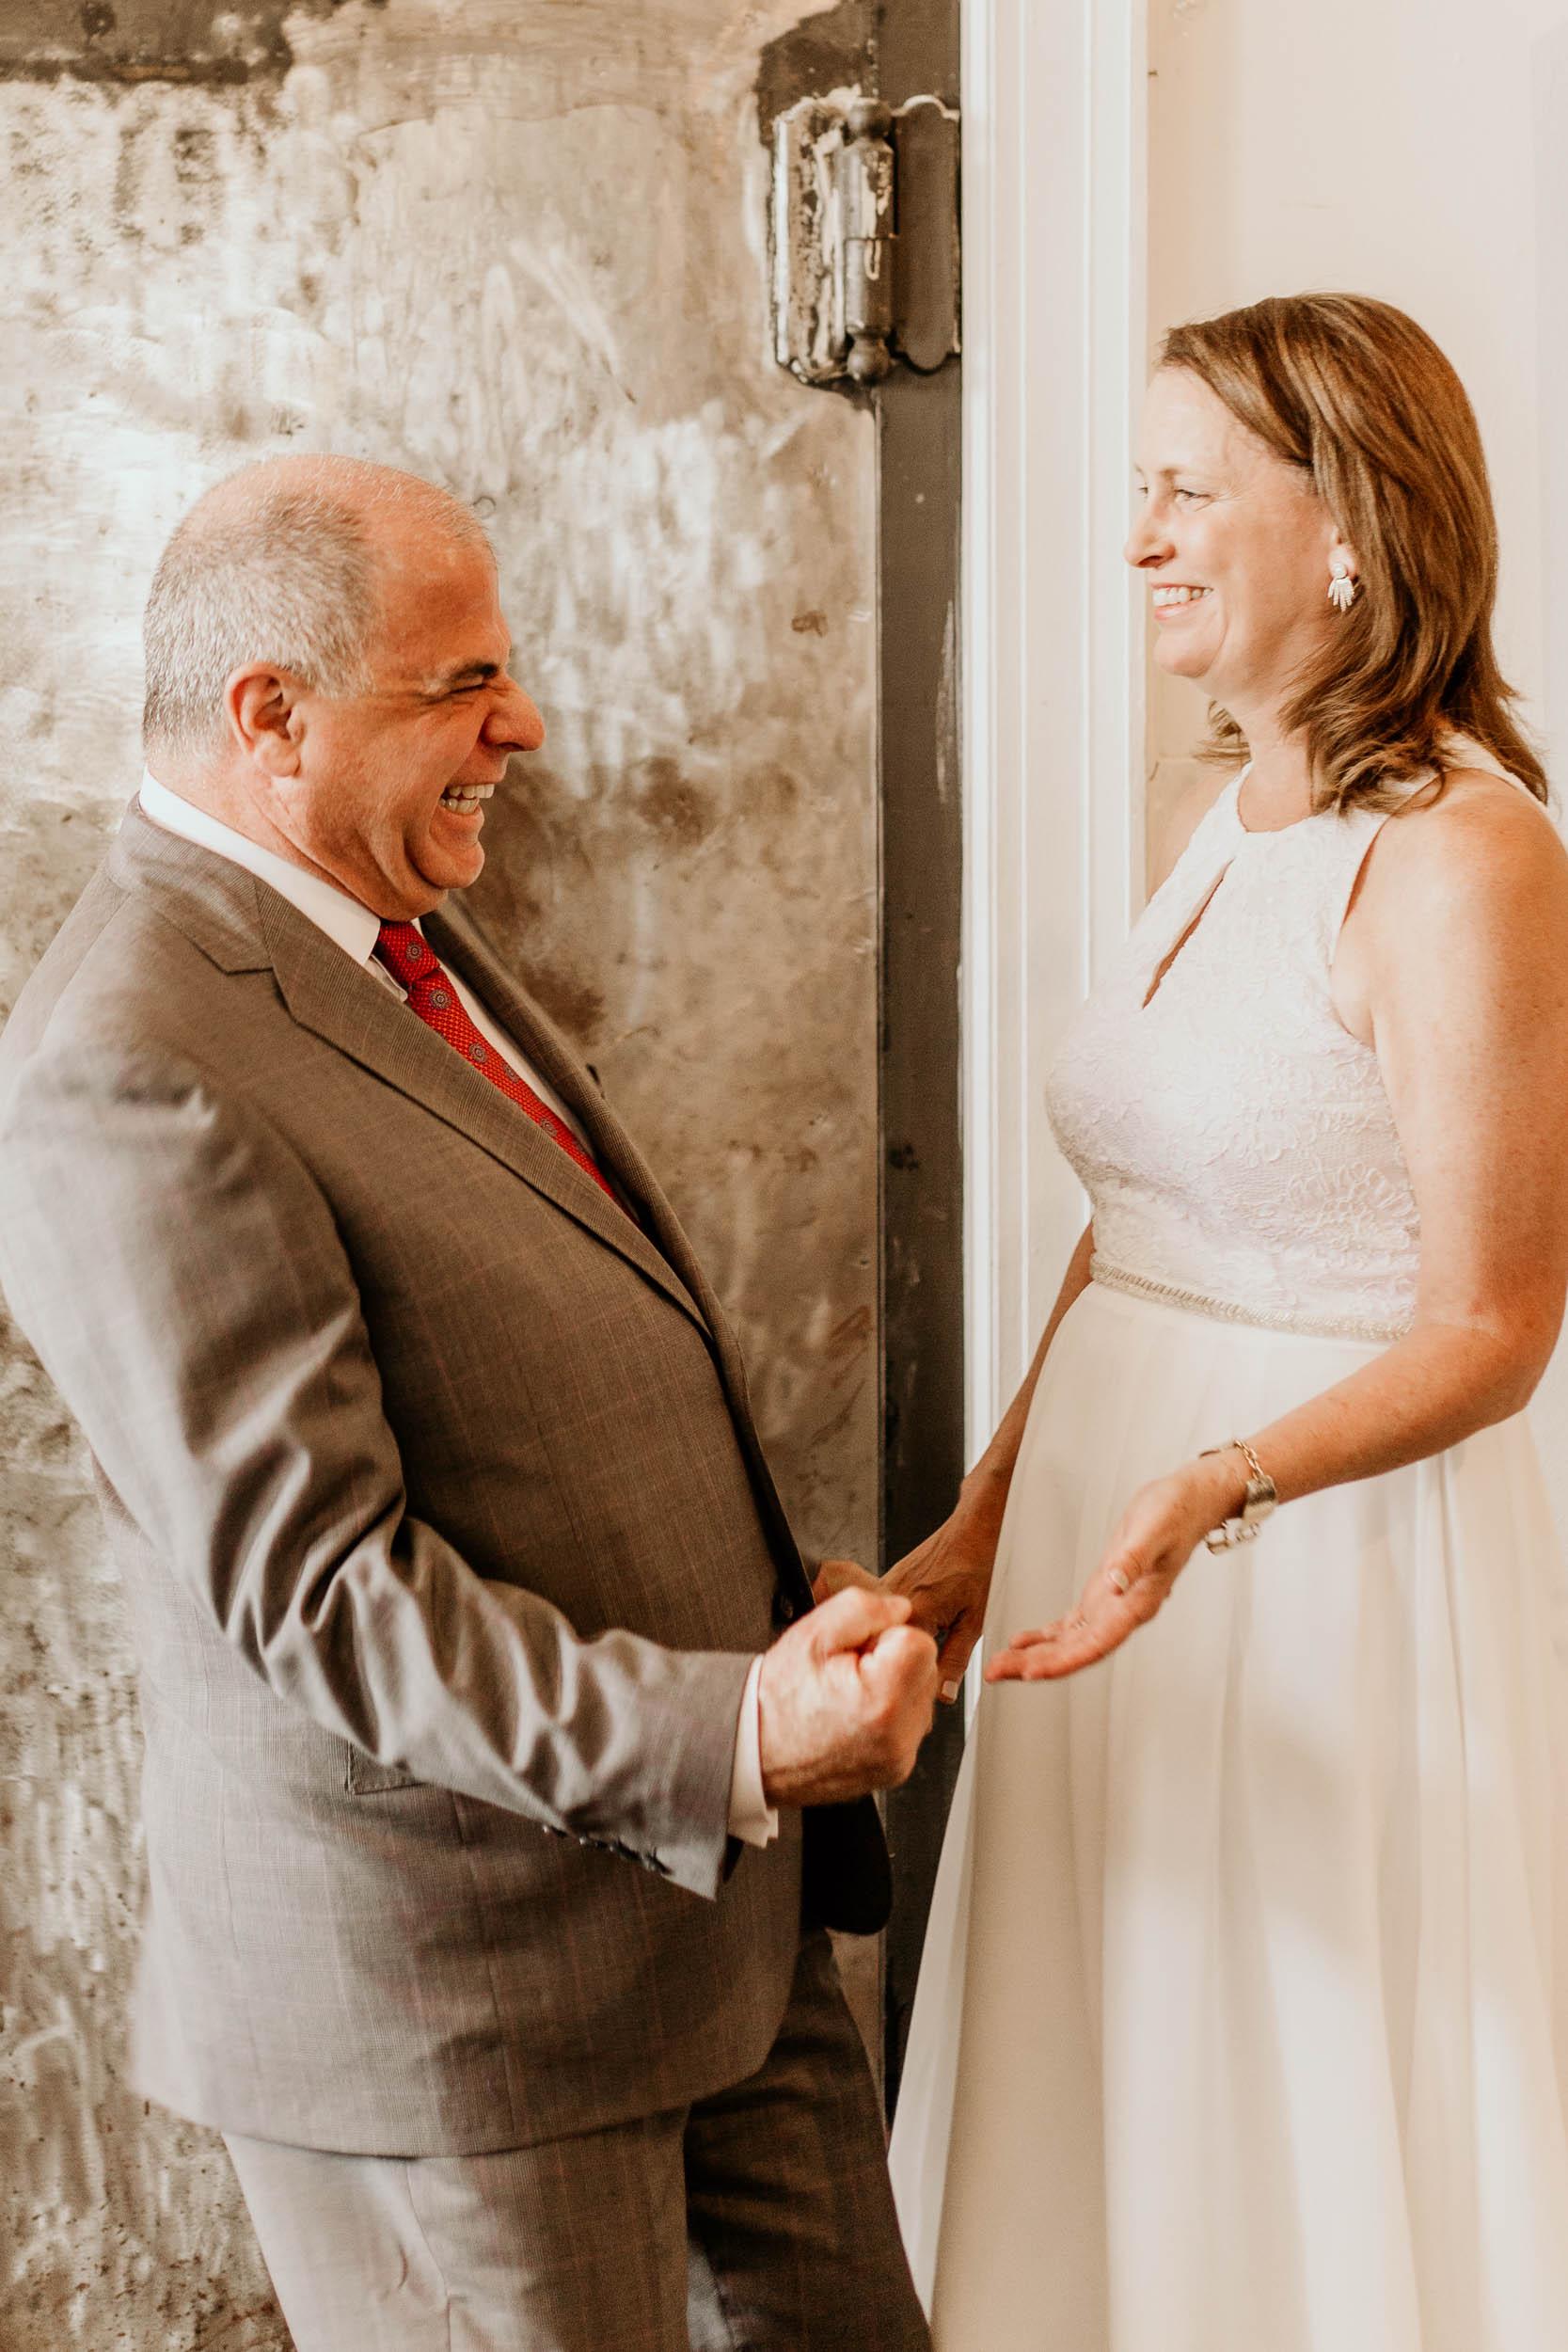 elopement-engagement-photographer-ottawa-4394.jpg